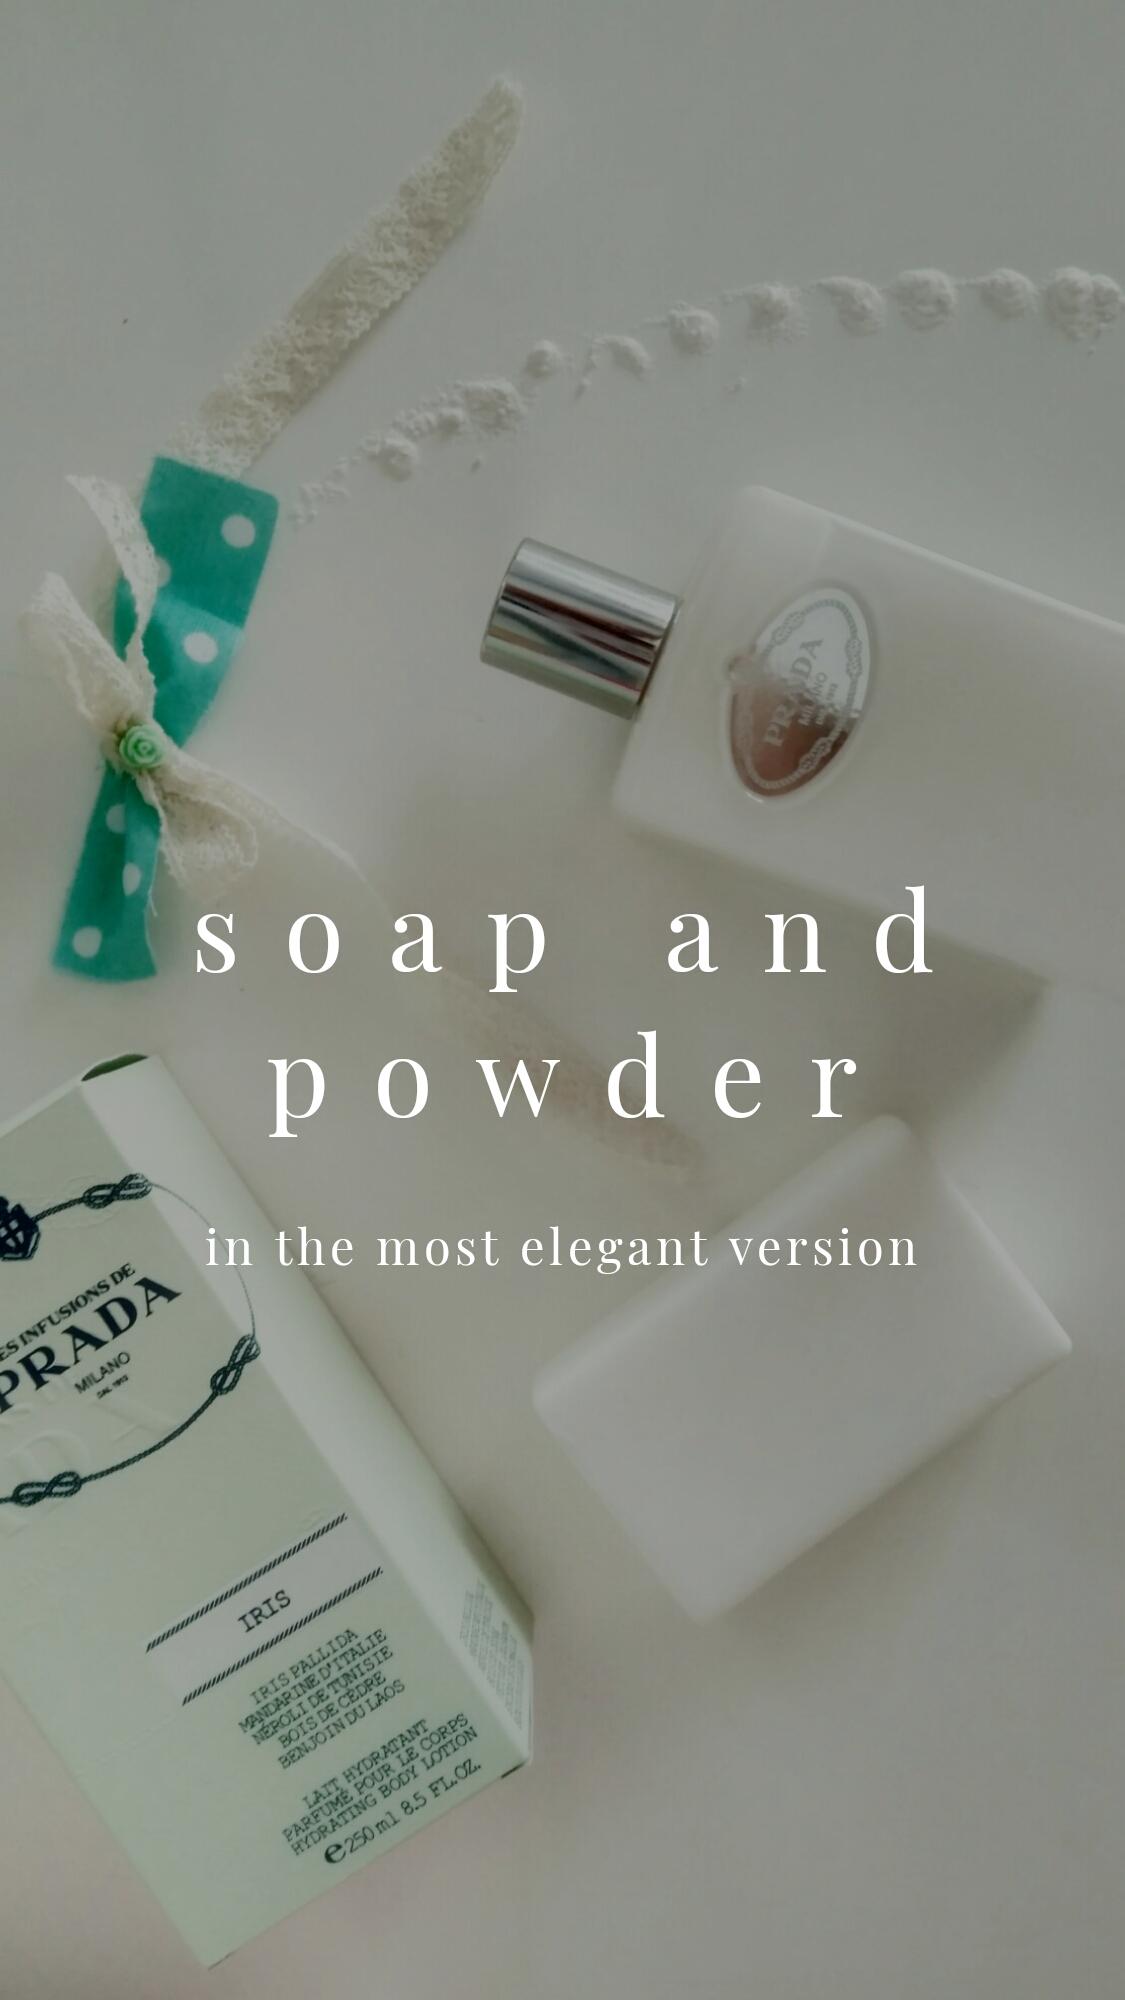 Fresh and clean in Prada!